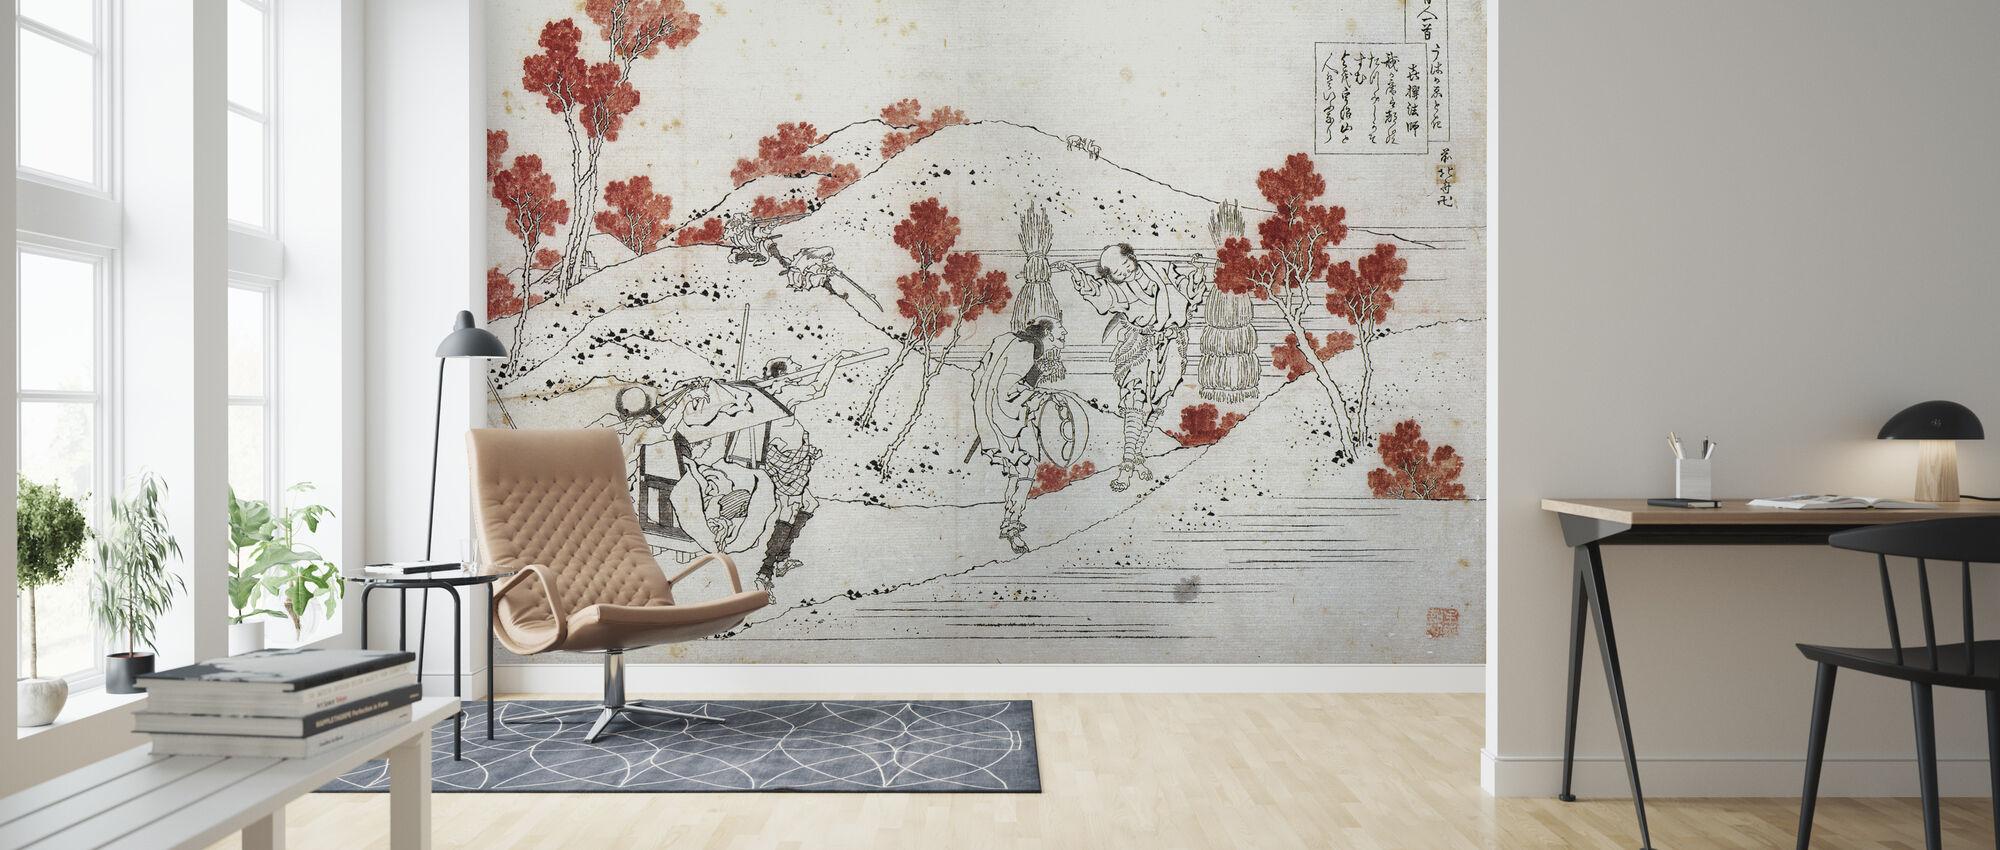 Porters Carry a Palanquin, Katsushika Hokusai - Wallpaper - Living Room